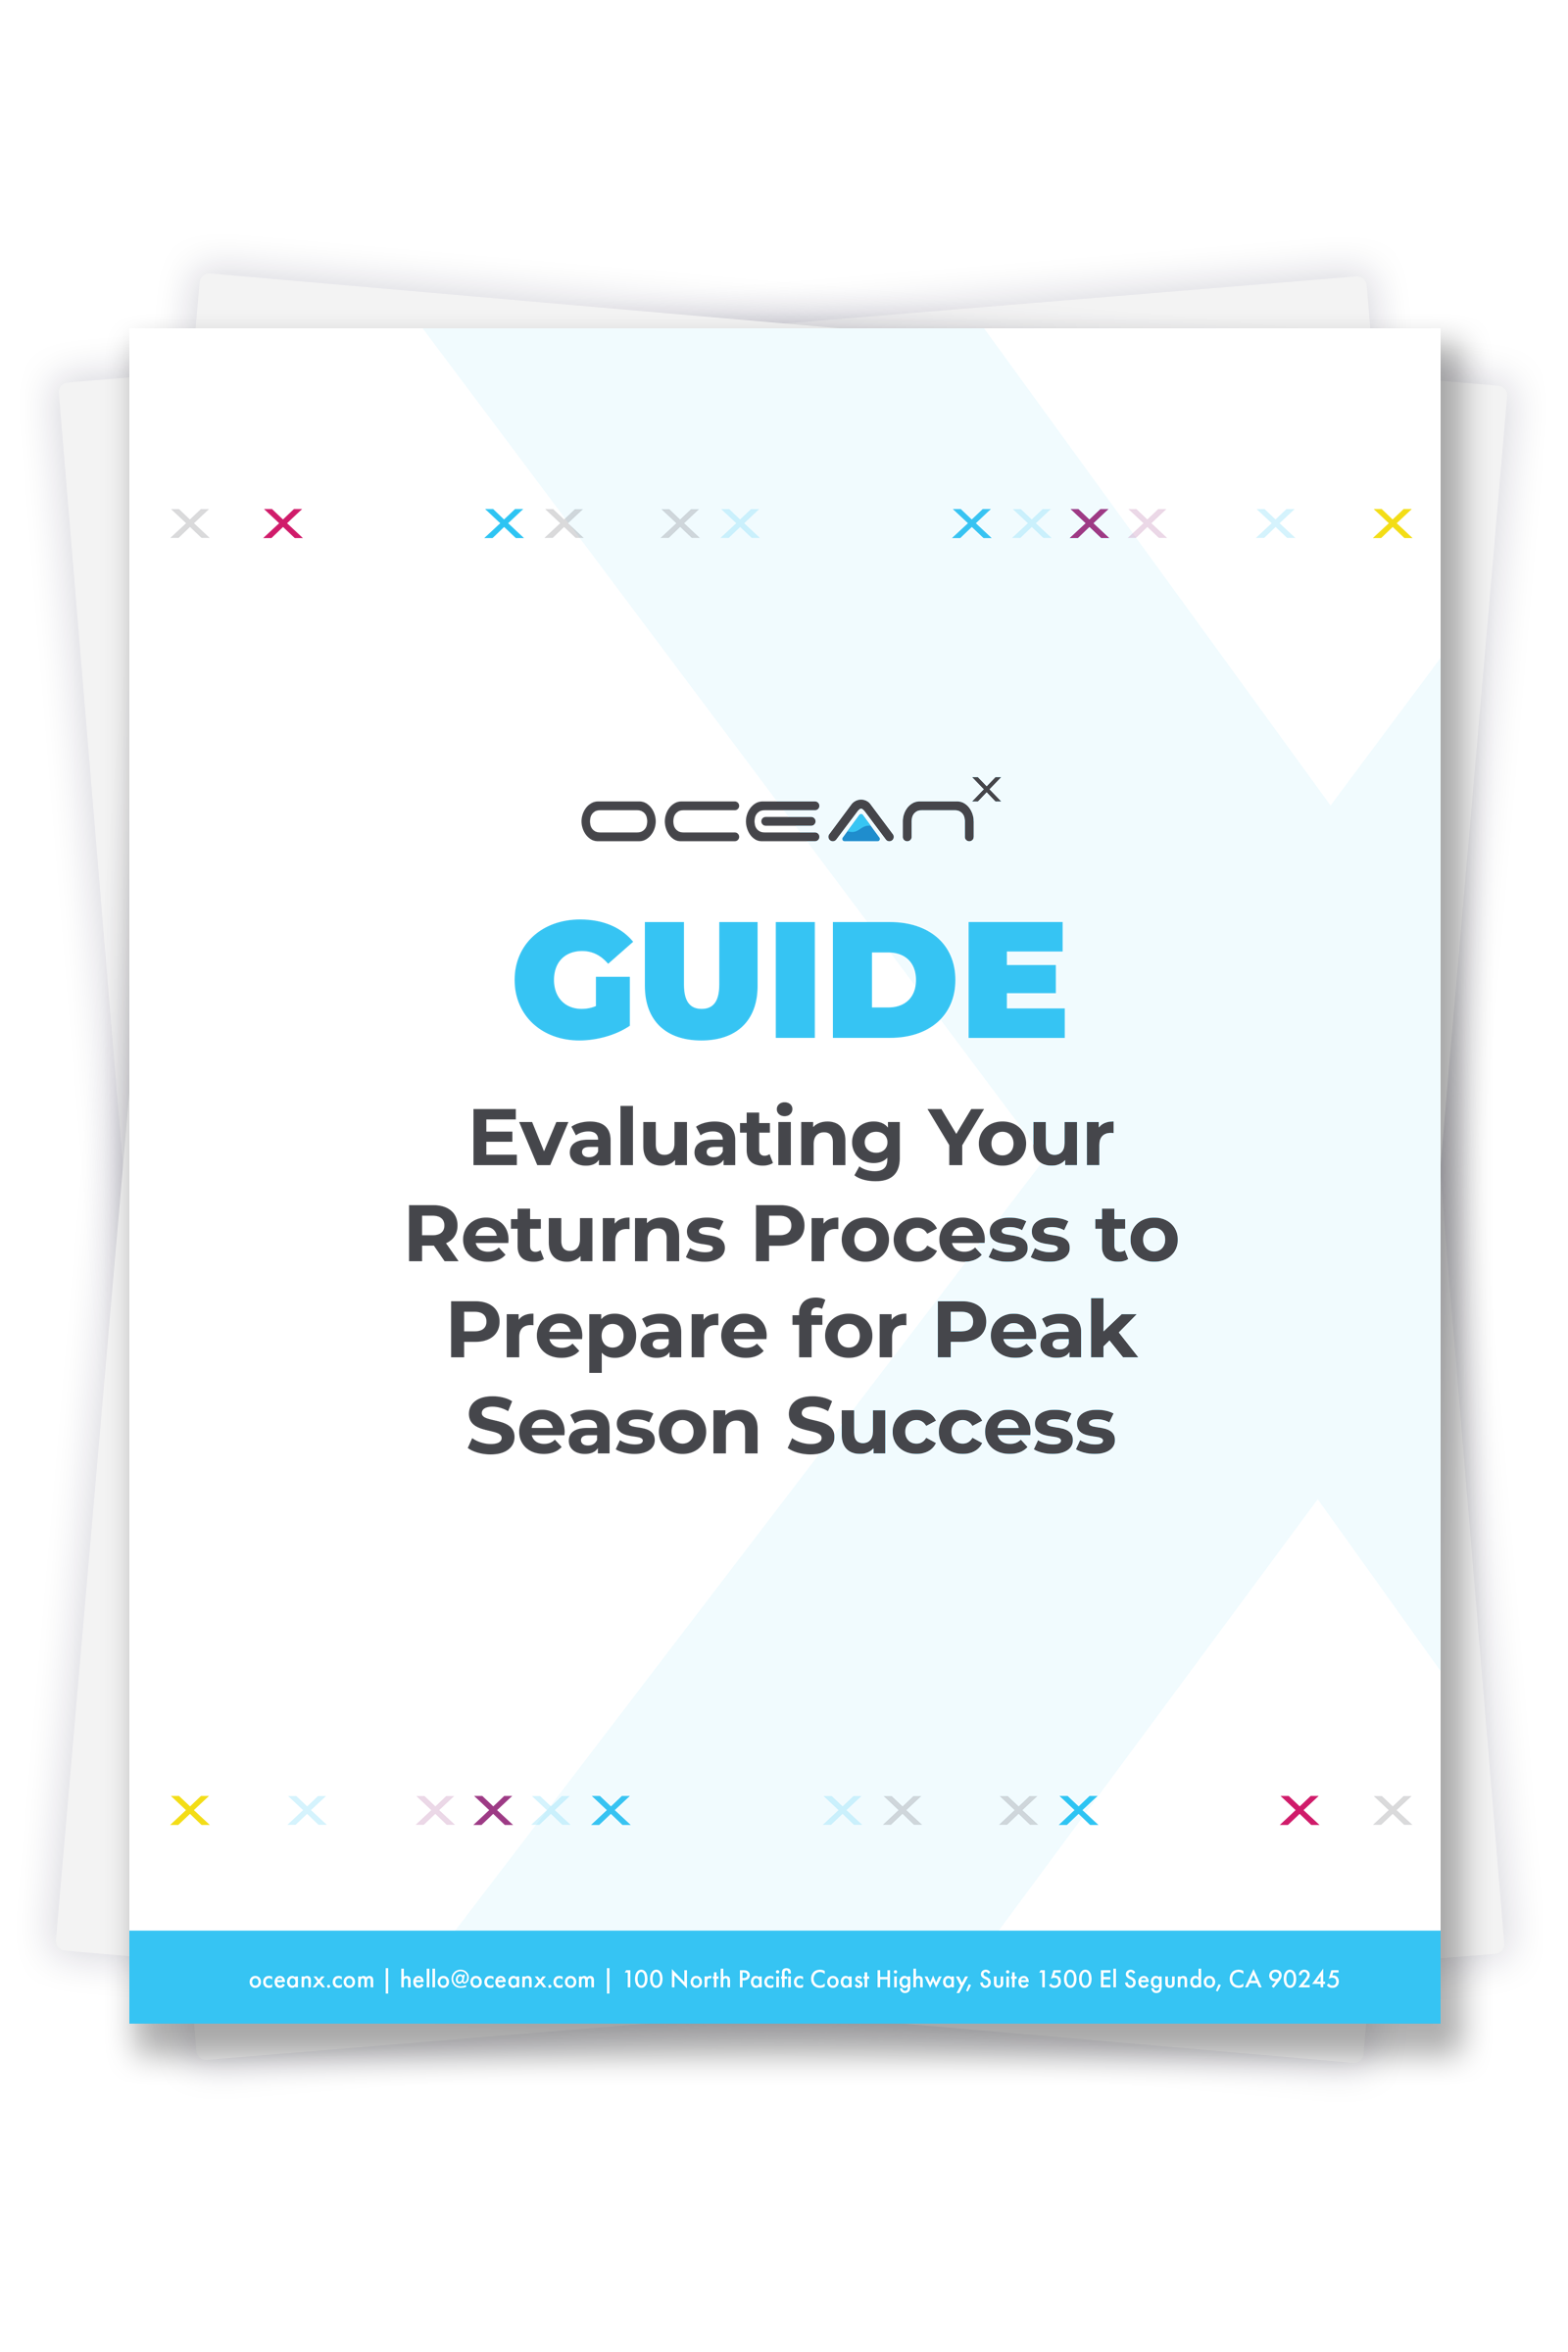 1084709_Cover Image (Evaluating Your Returns Process to Prepare for Peak Season Success)_01_060721